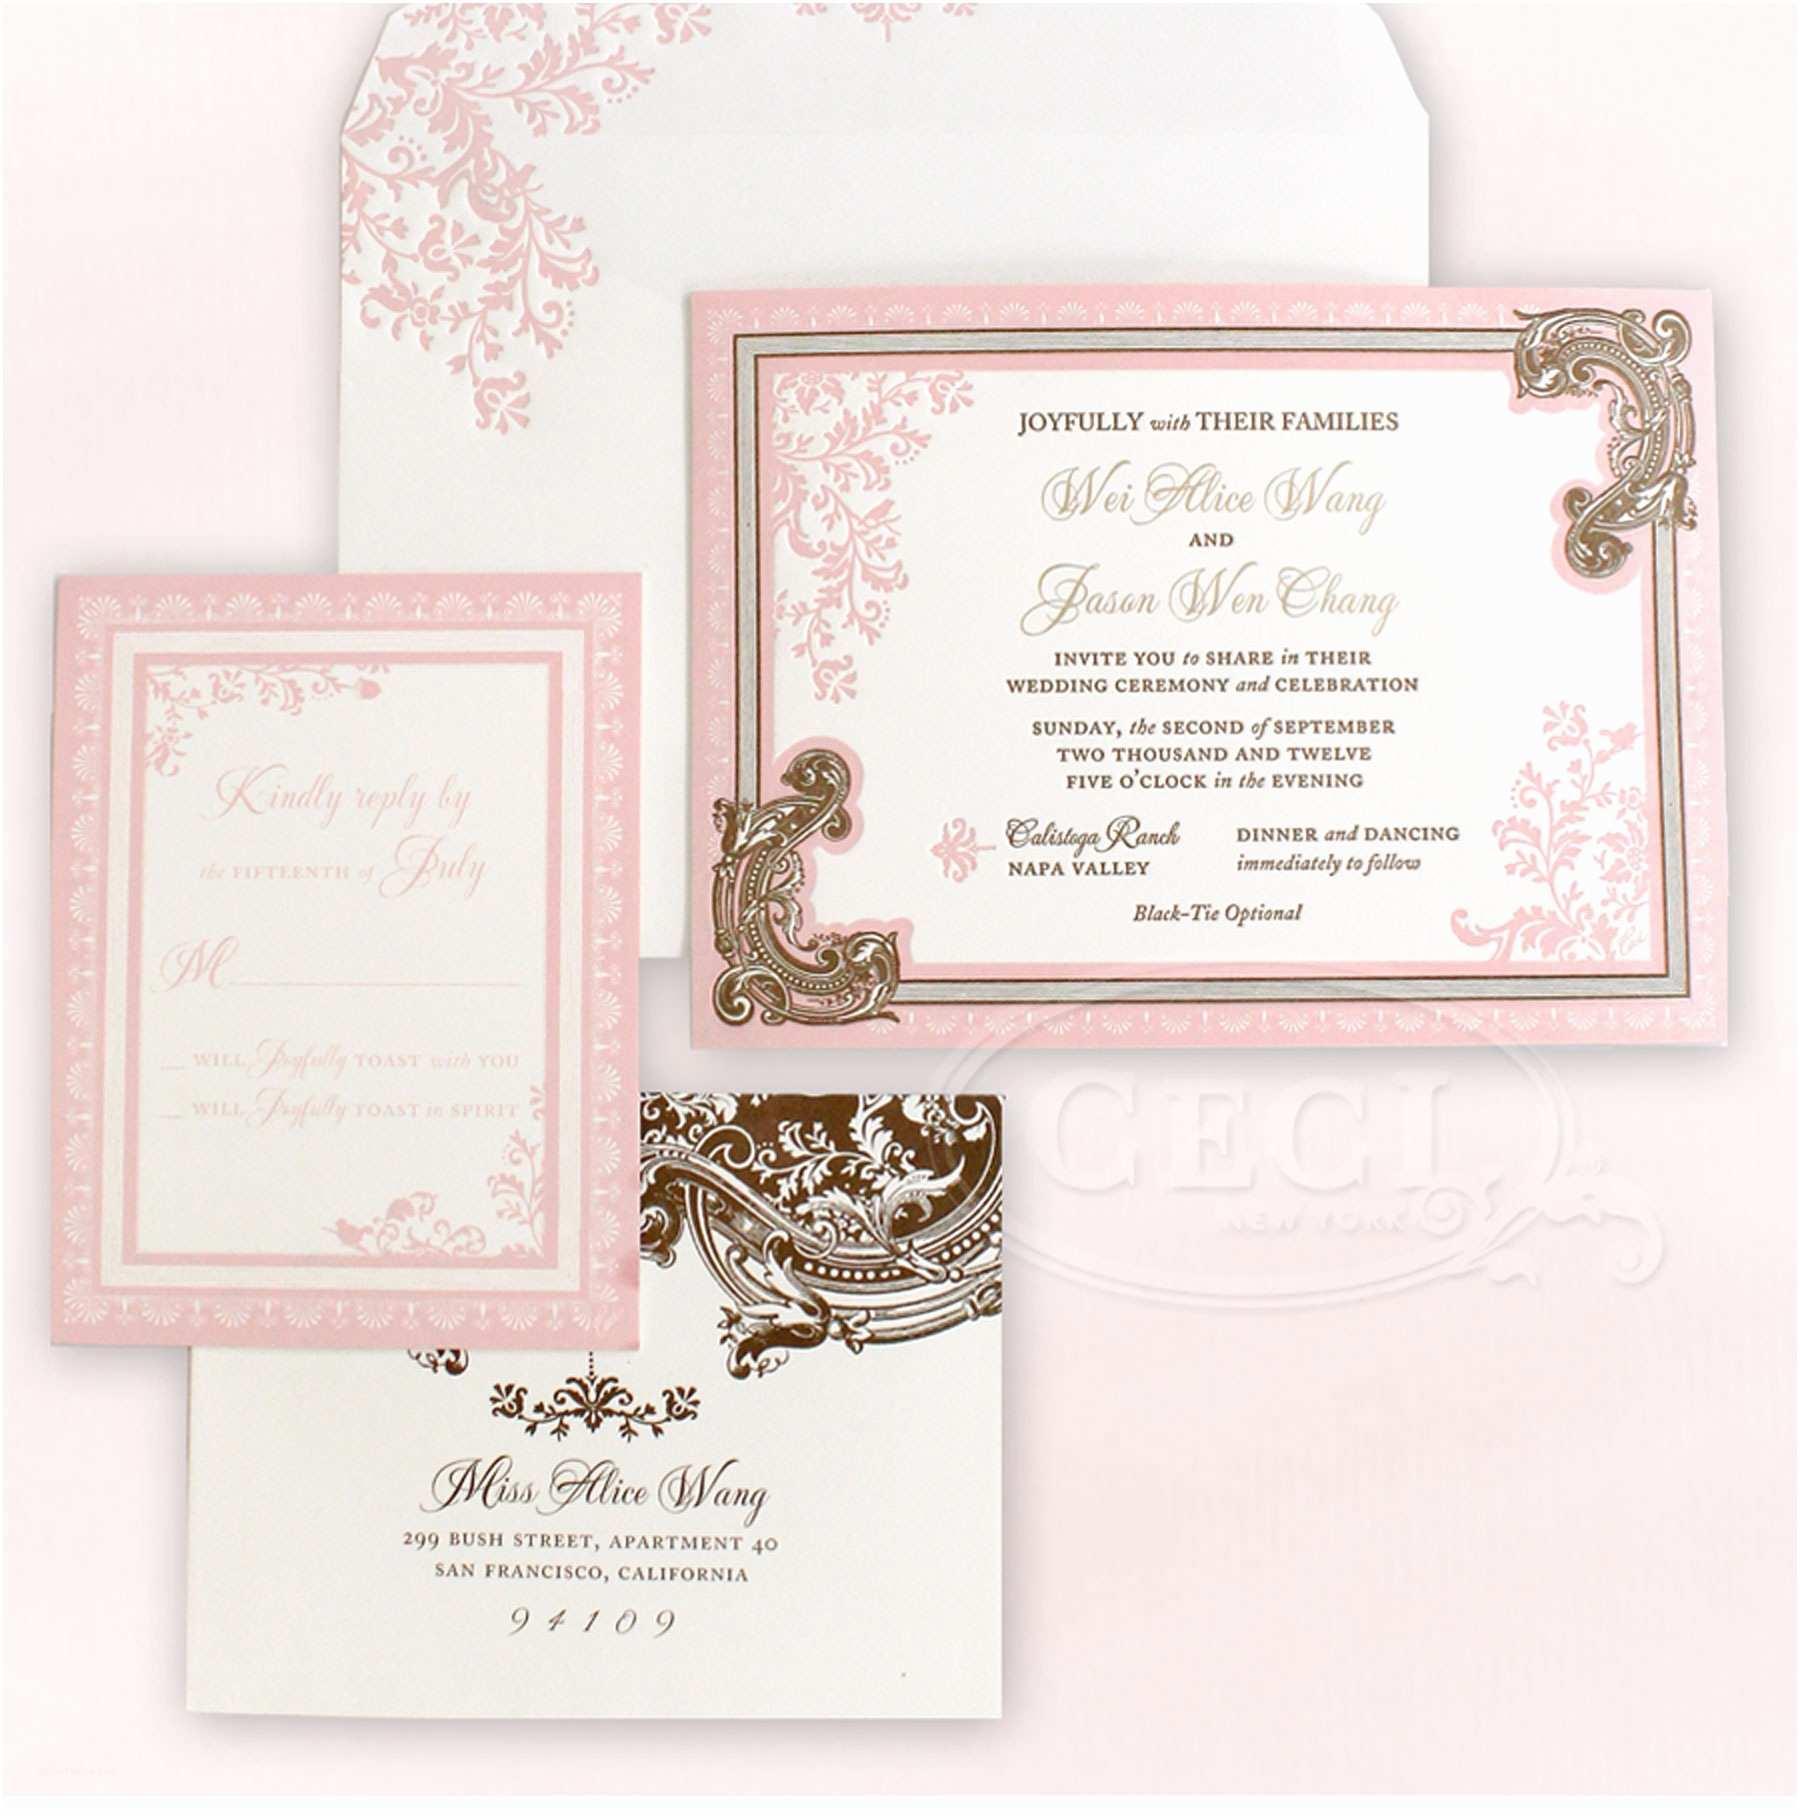 Romantic Wedding Invitations V165 Our Muse Elegant ornate Wedding Alice and Jason